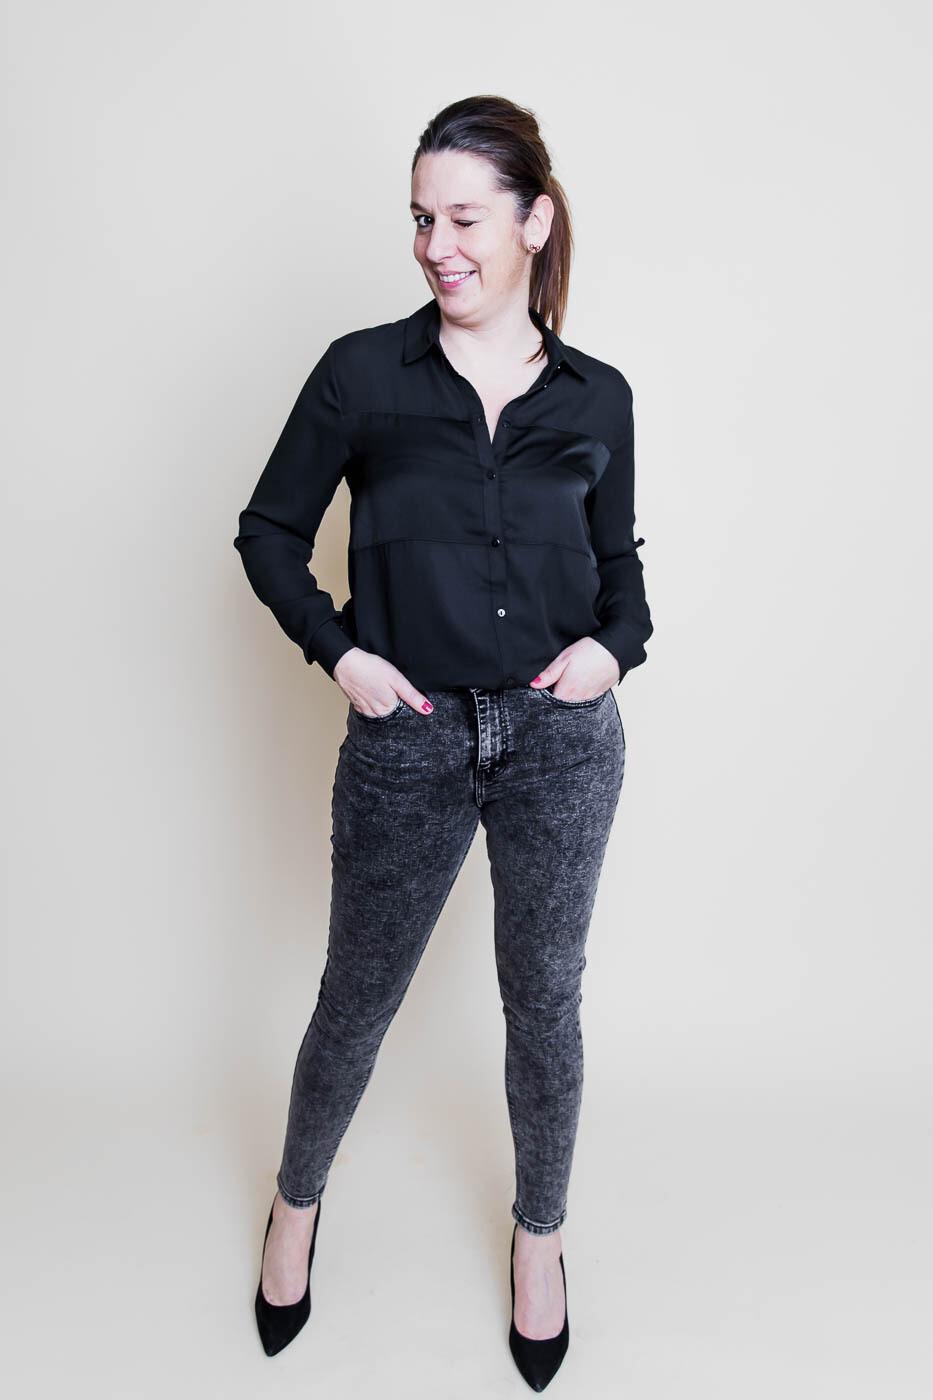 Skinny jeans - TYGA - donkergrijs snowed 32''